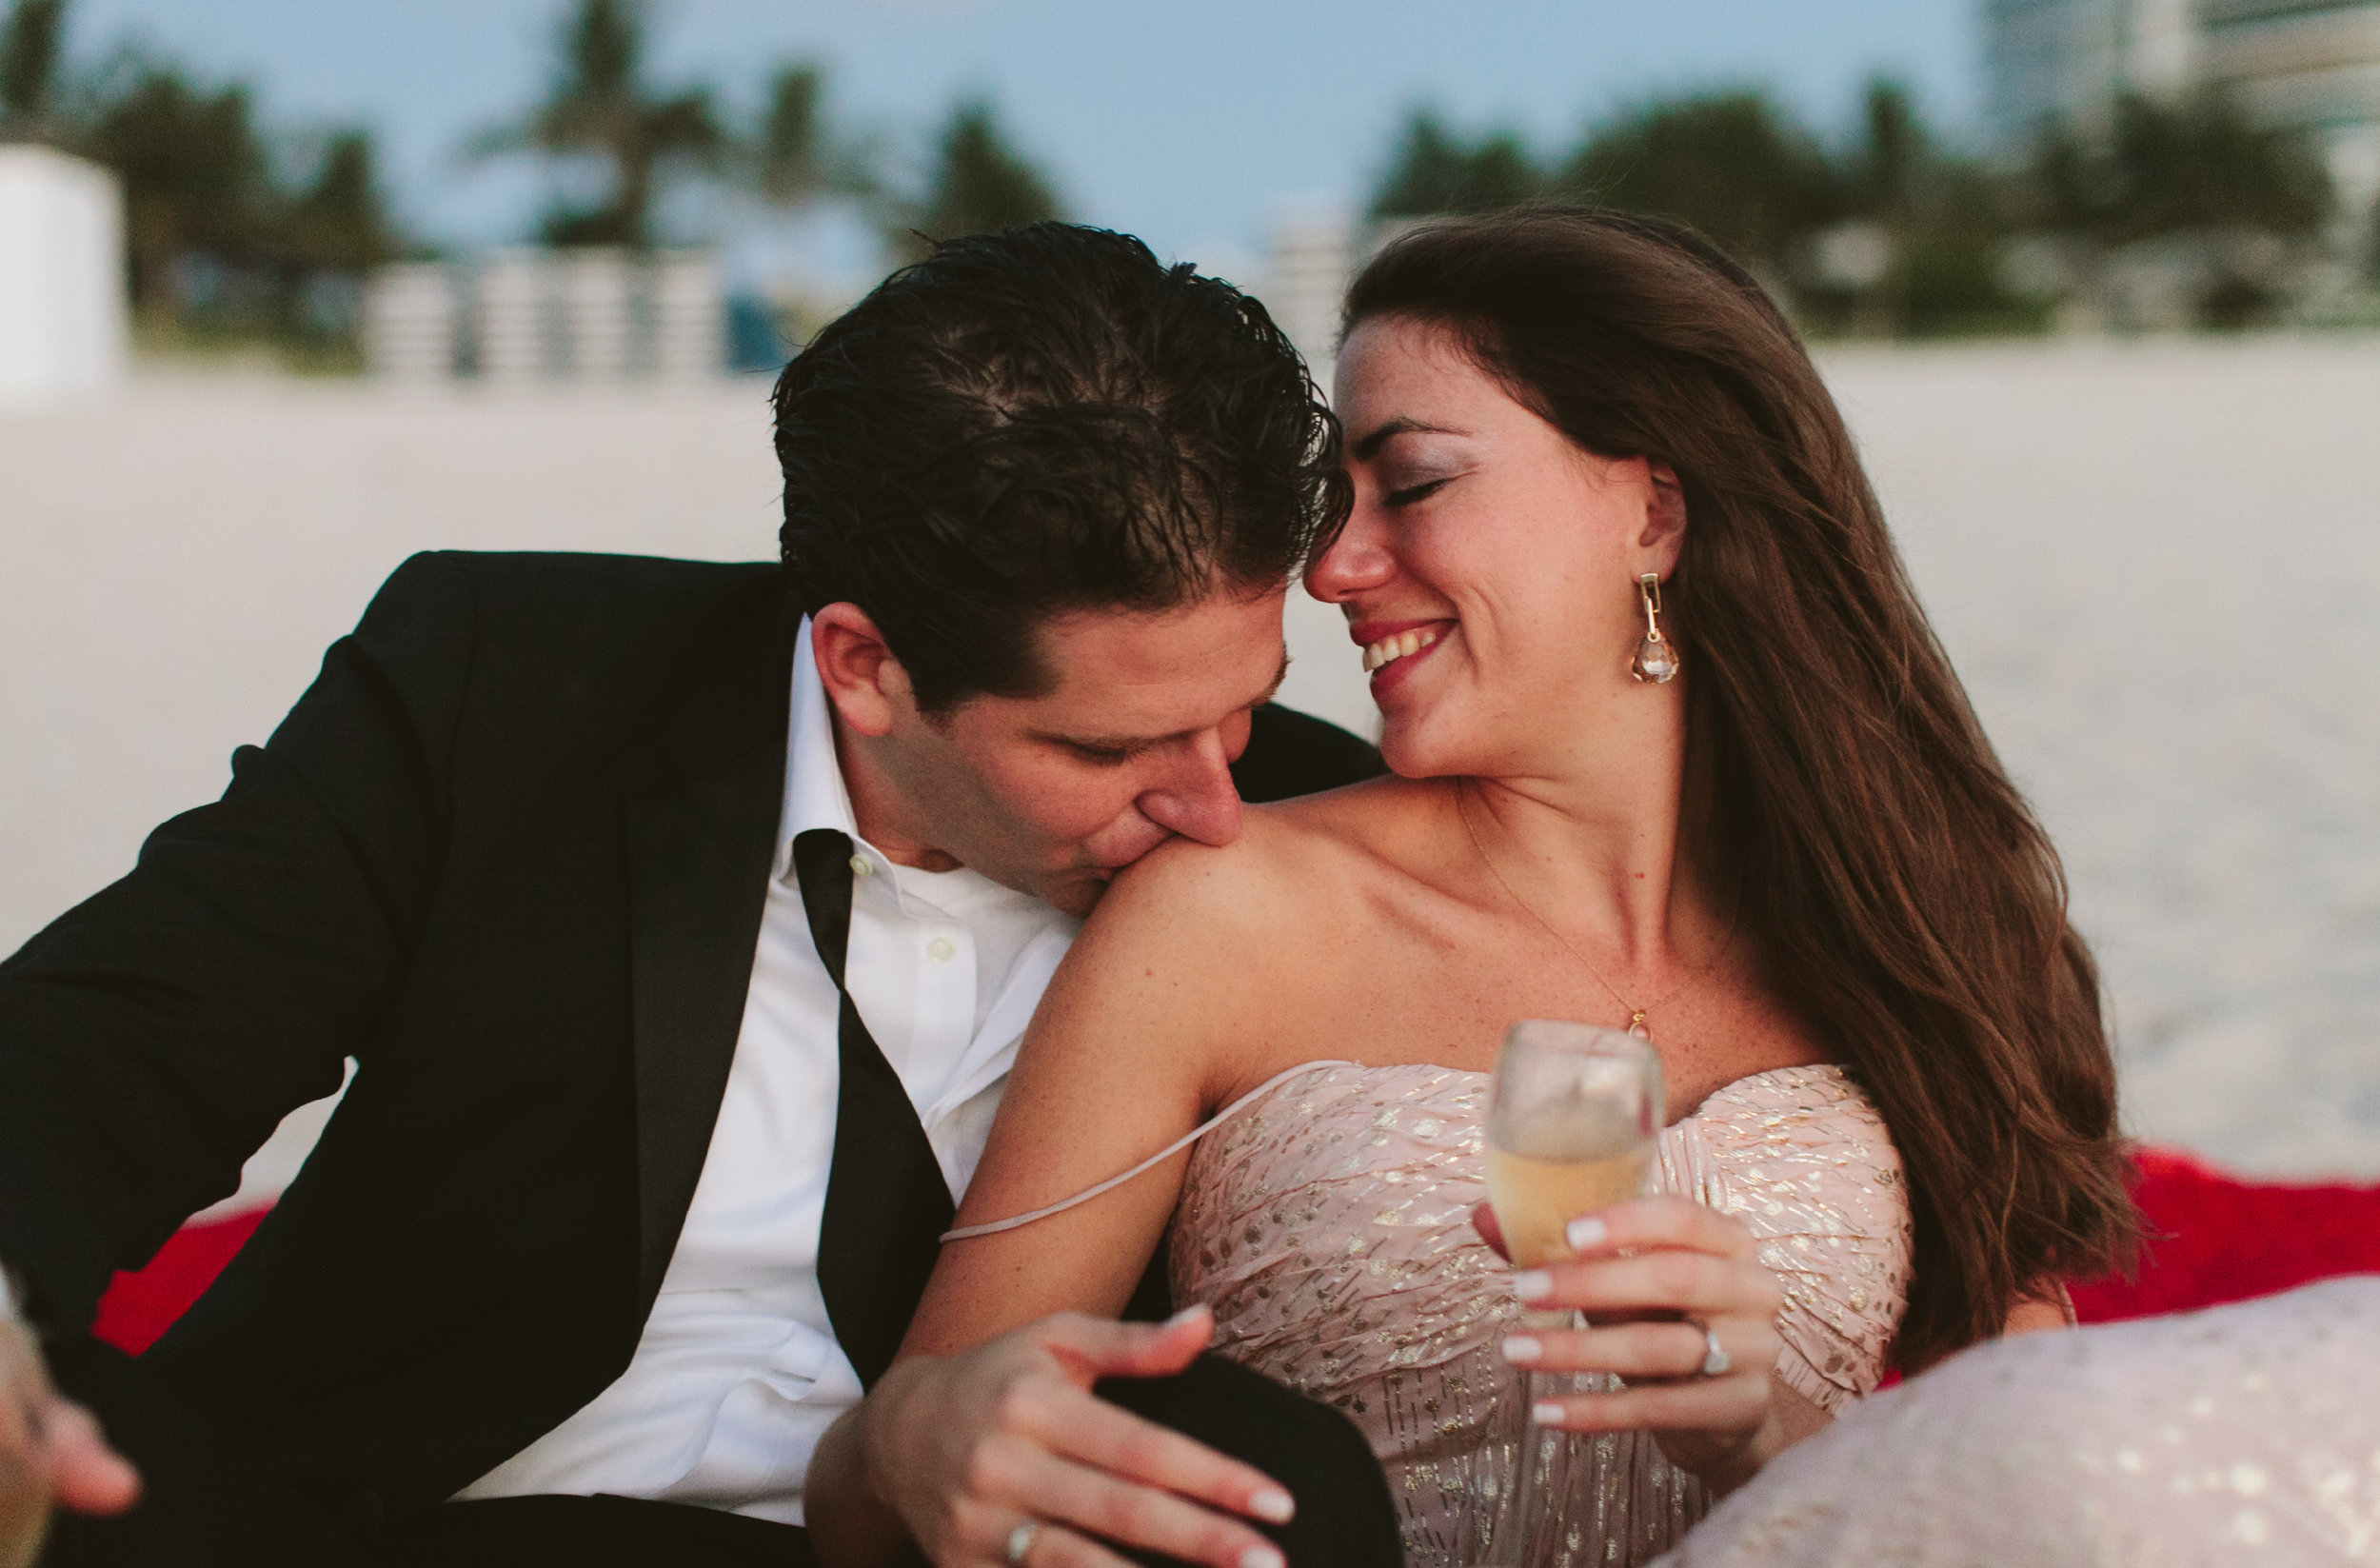 Meli + Mike South Pointe Park South Beach Miami Engagement Shoot10.jpg